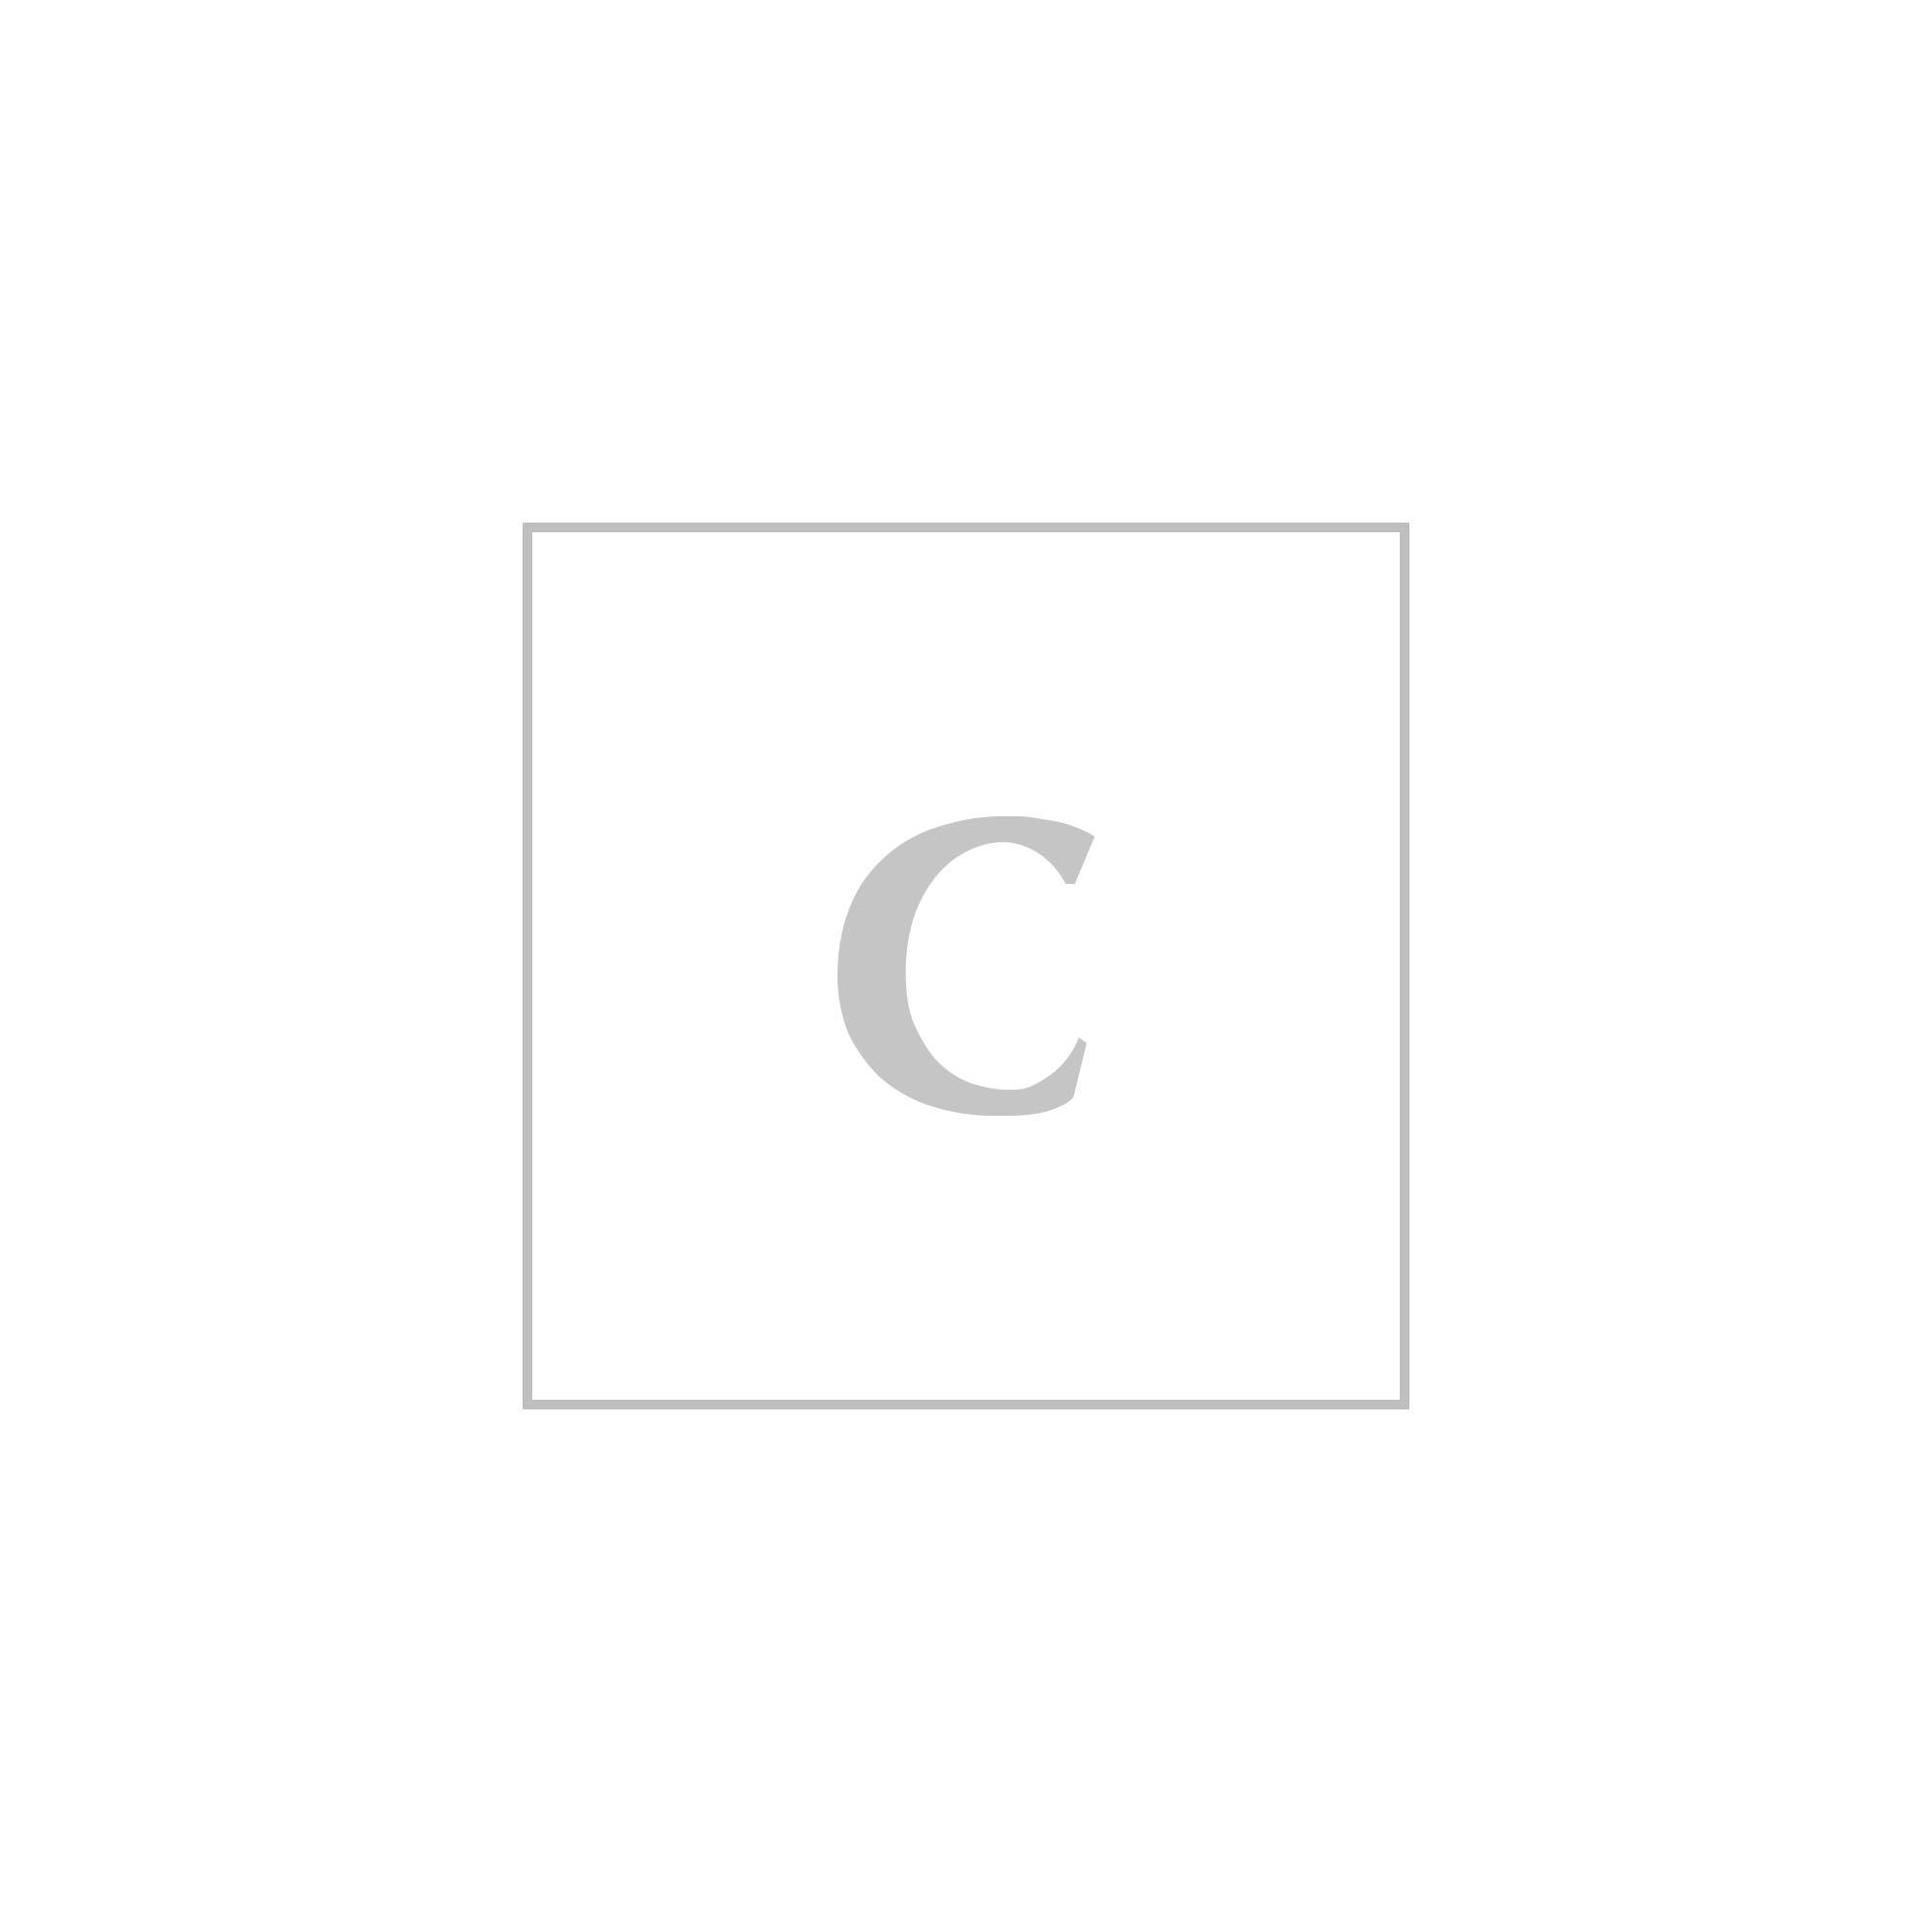 Saint laurent ysl borsa monogramme medium